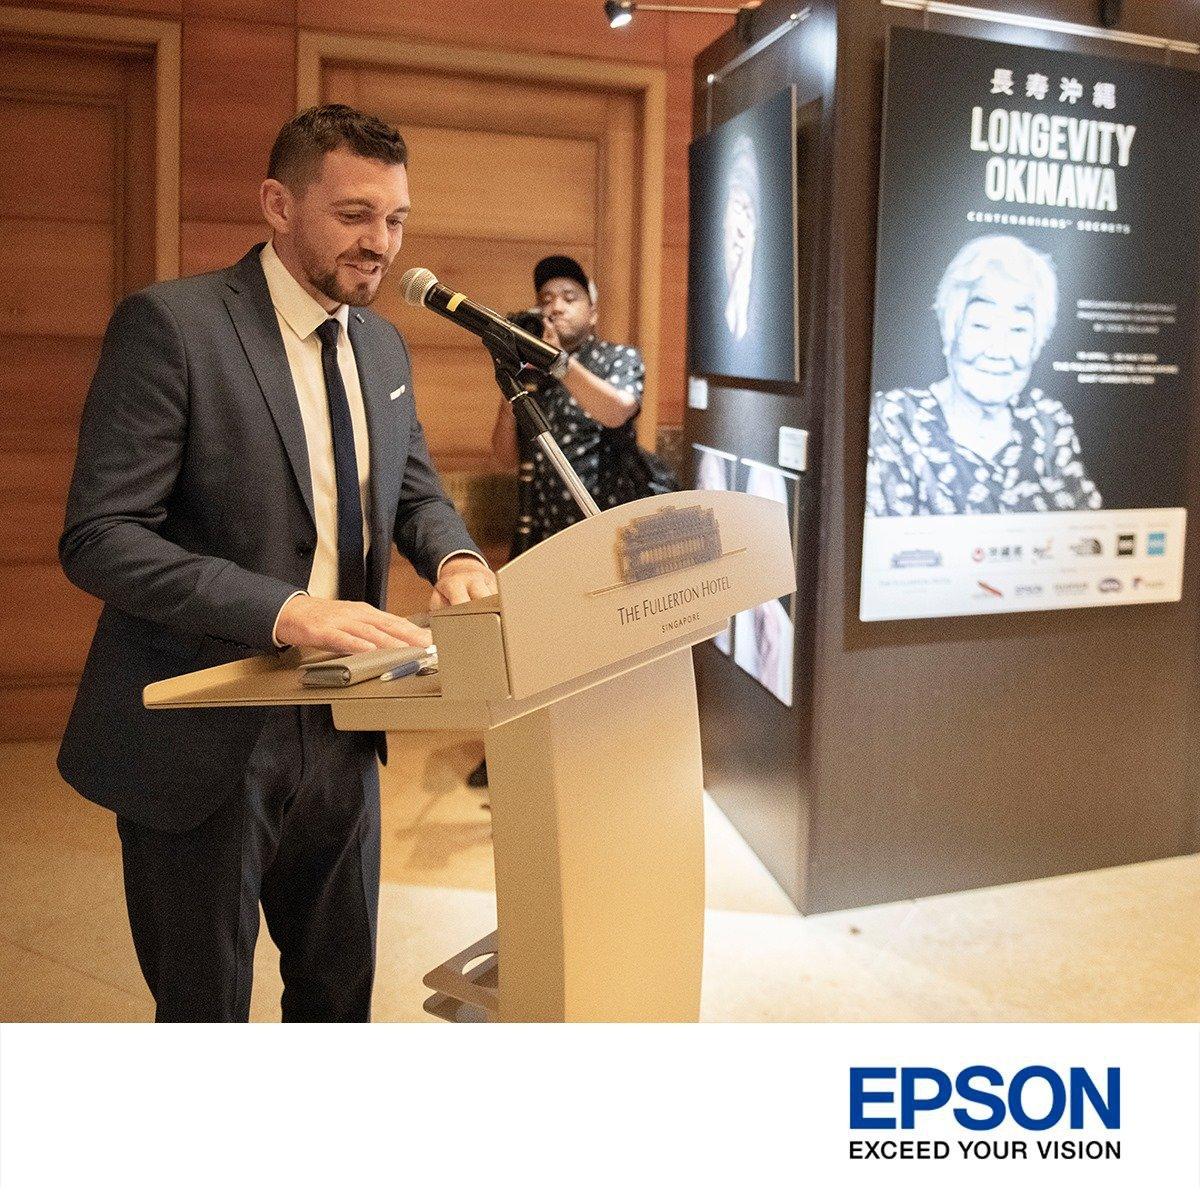 Epson printer photography exhibition singapore Jose Jeuland speech